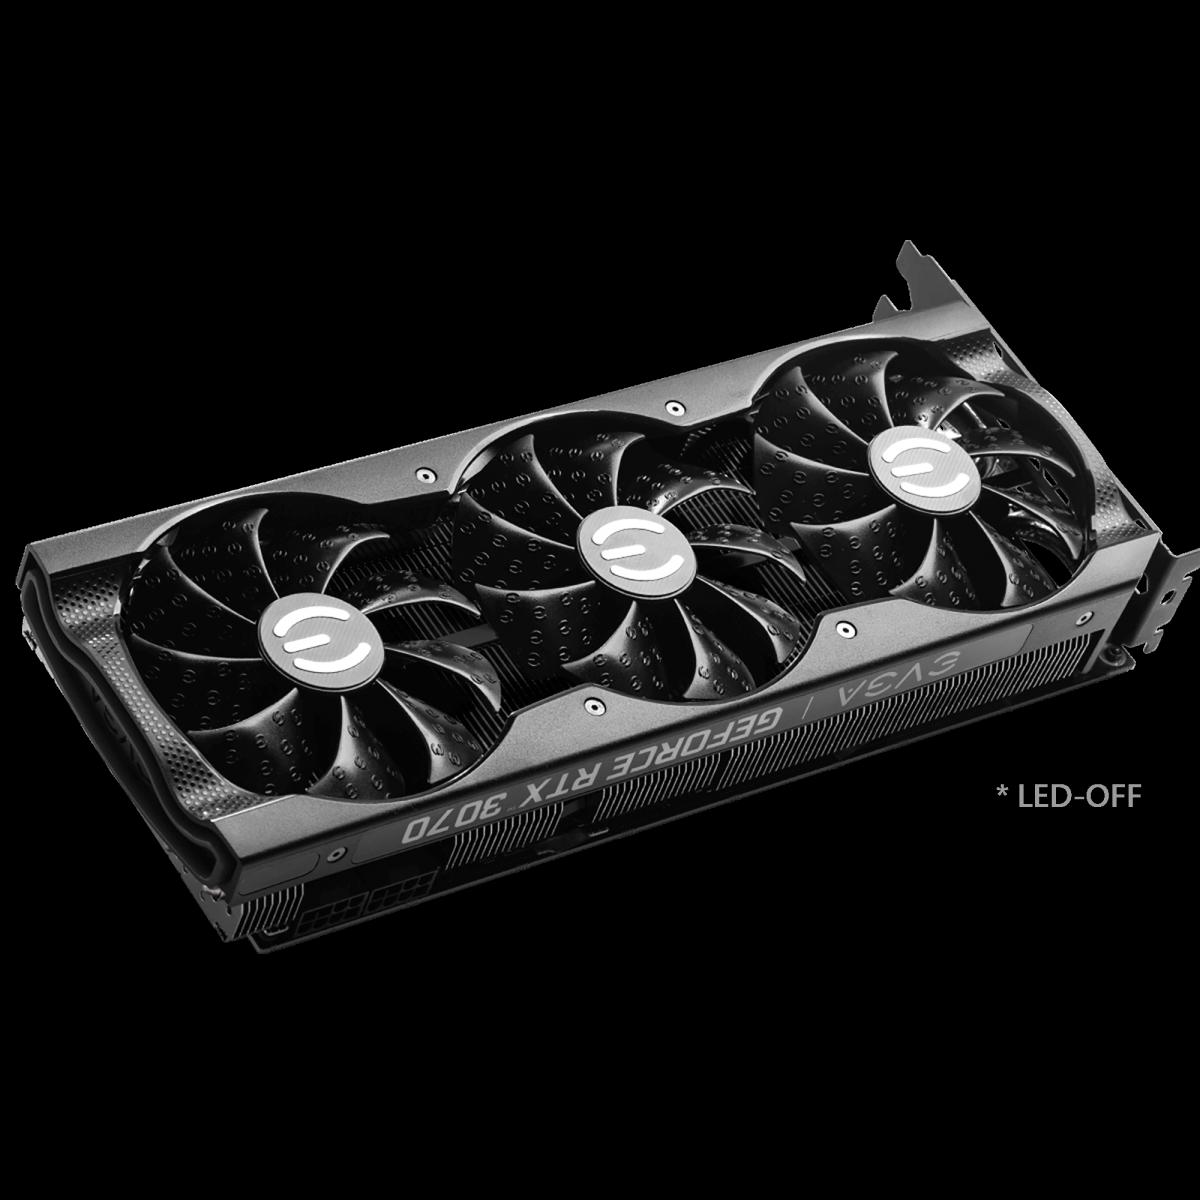 Placa de Vídeo EVGA GeForce RTX 3070 XC3 Black Gaming, 8GB, GDDR6, 256bit, 08G-P5-3751-KR